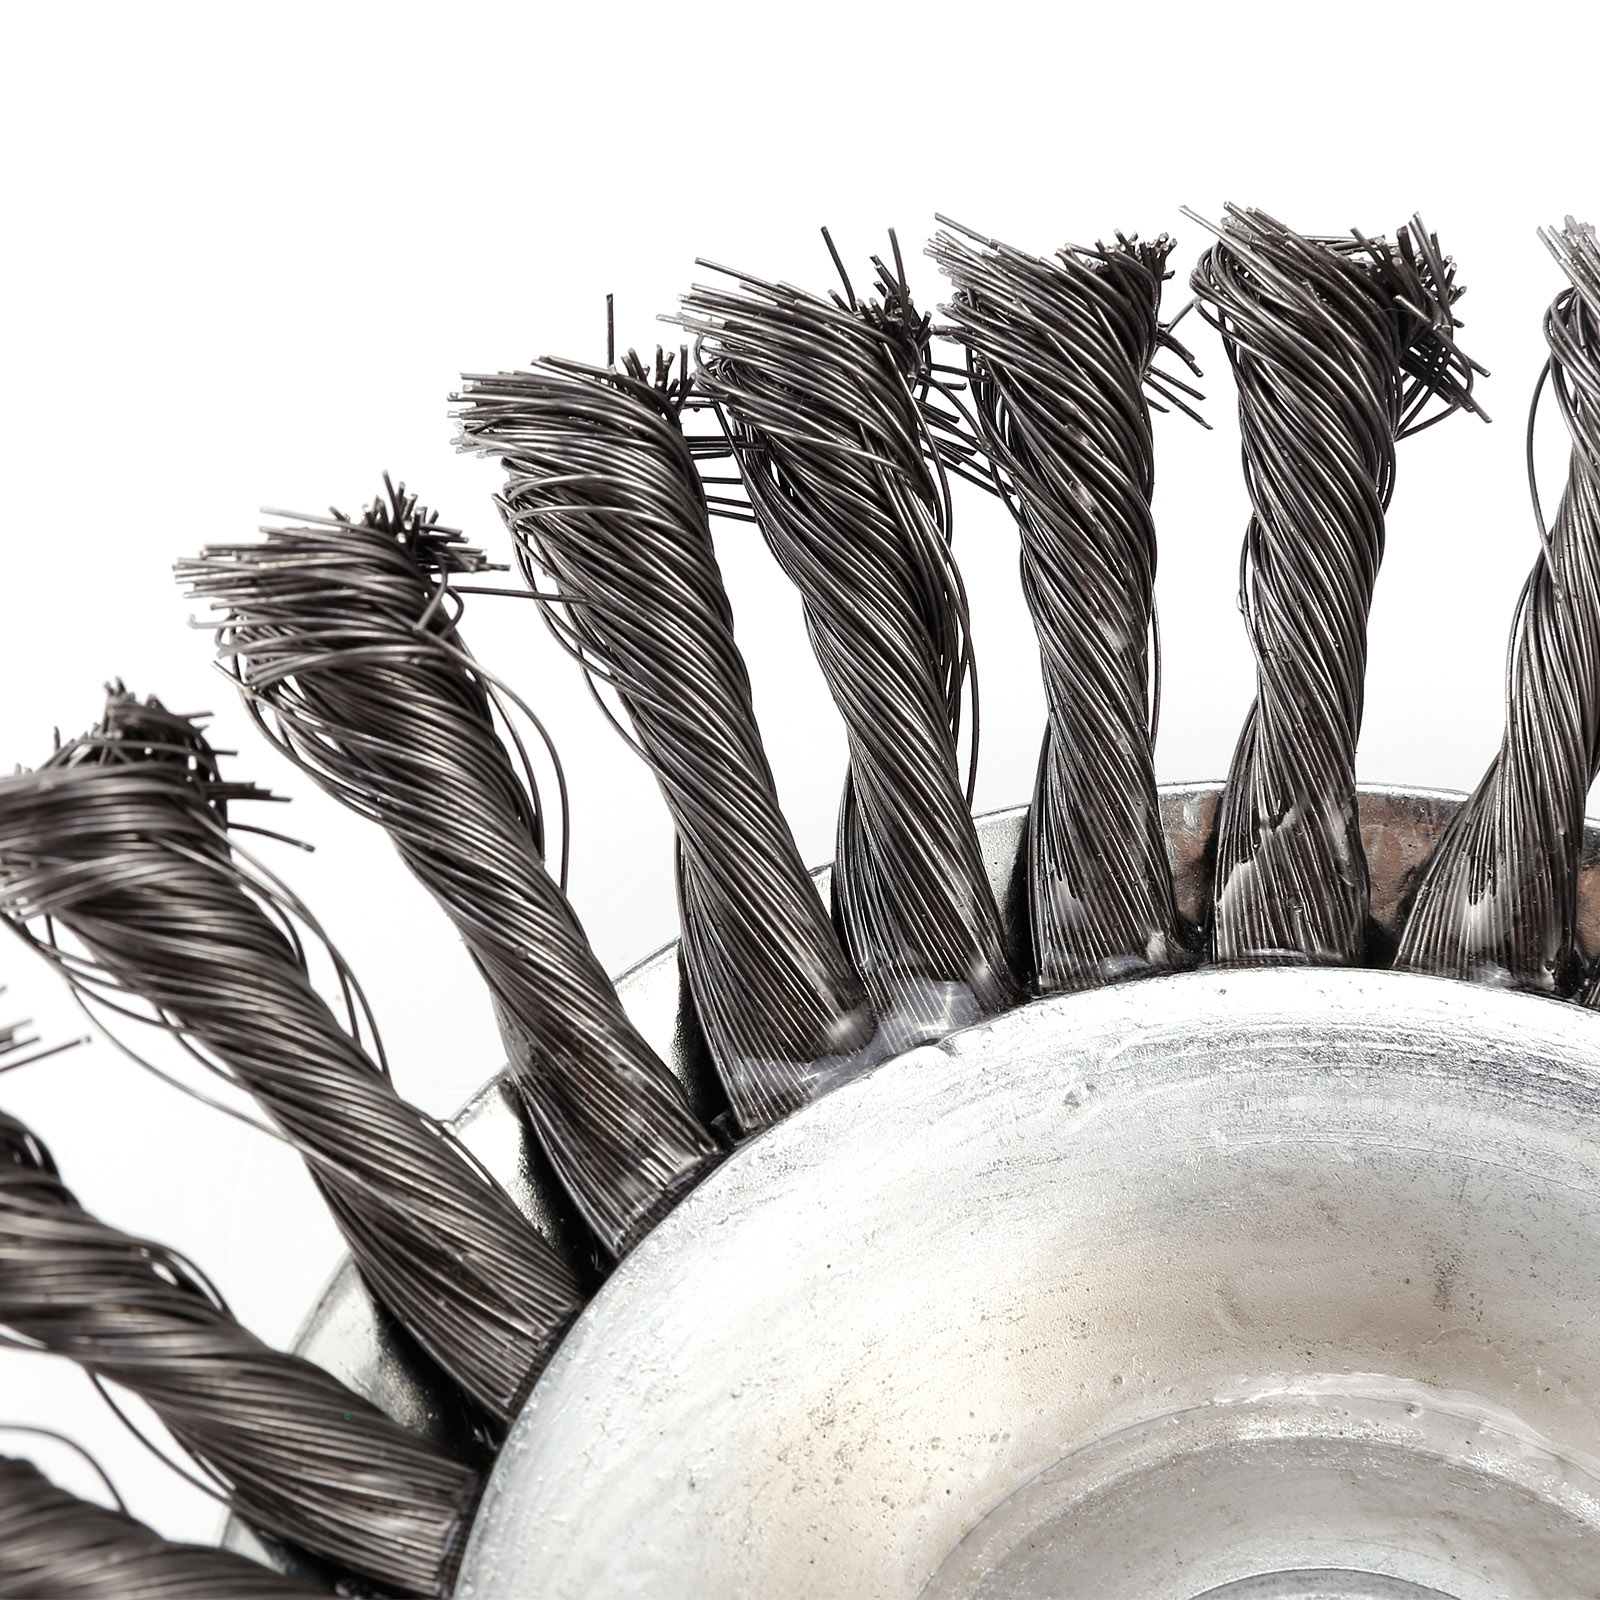 Braid brush - Brush braid   Etsy  25 Adobe Illustrator Brush Sets